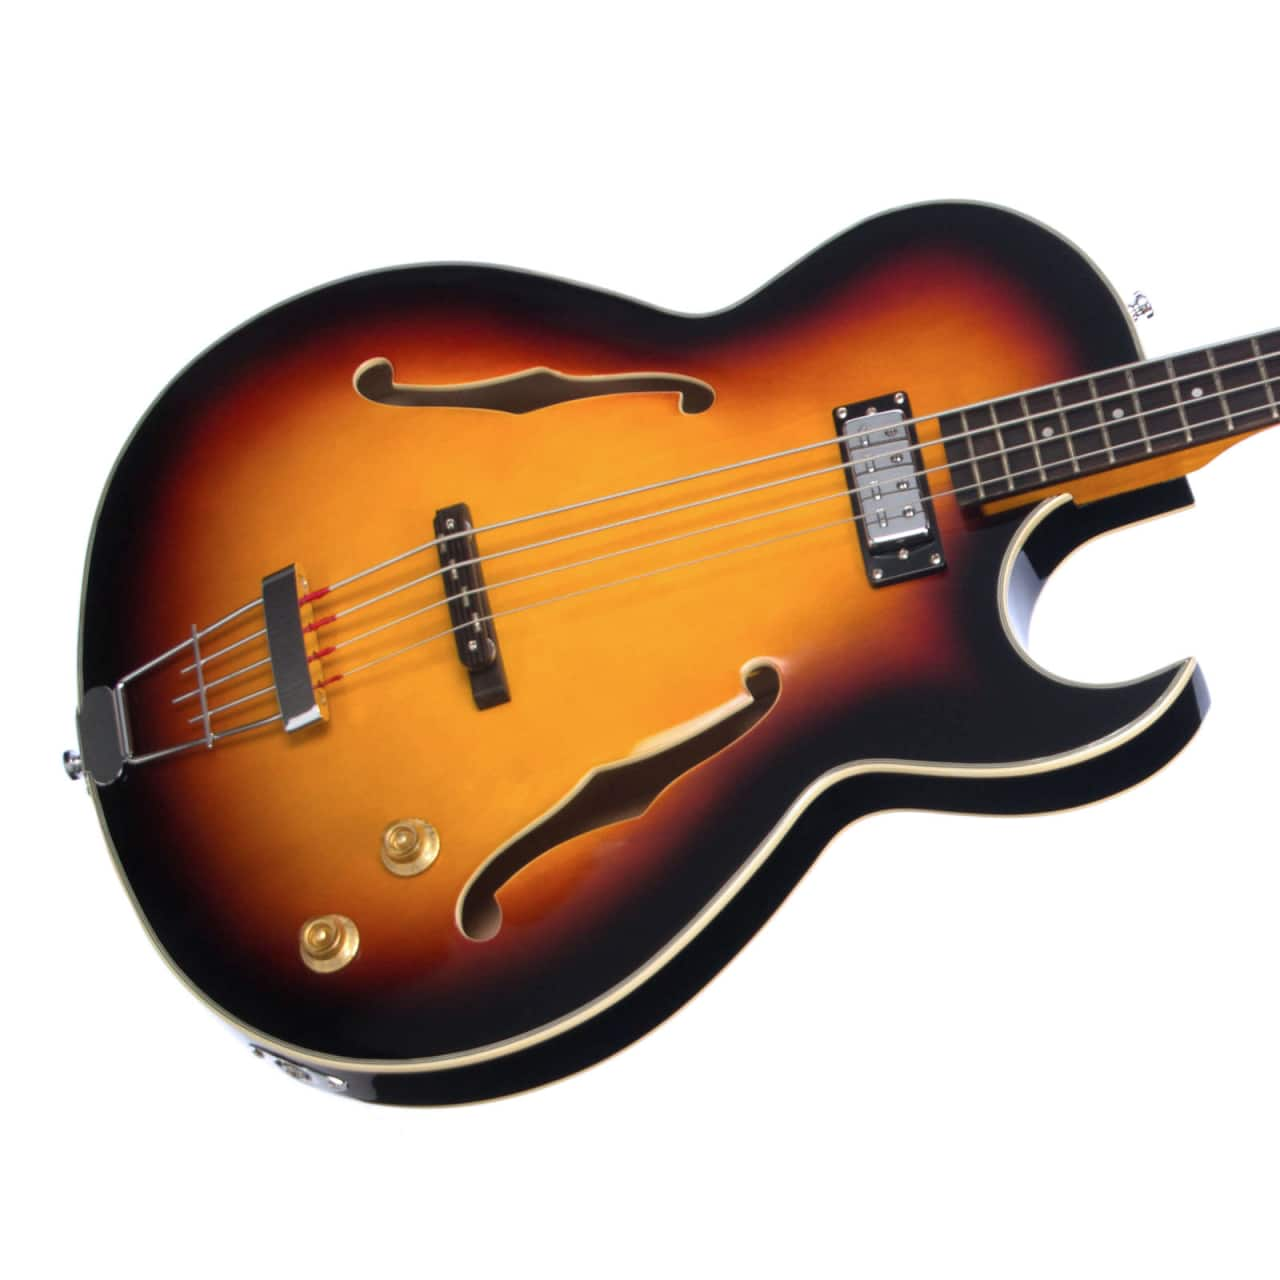 eastwood guitars saturn iv semi hollow electric bass guitar reverb. Black Bedroom Furniture Sets. Home Design Ideas